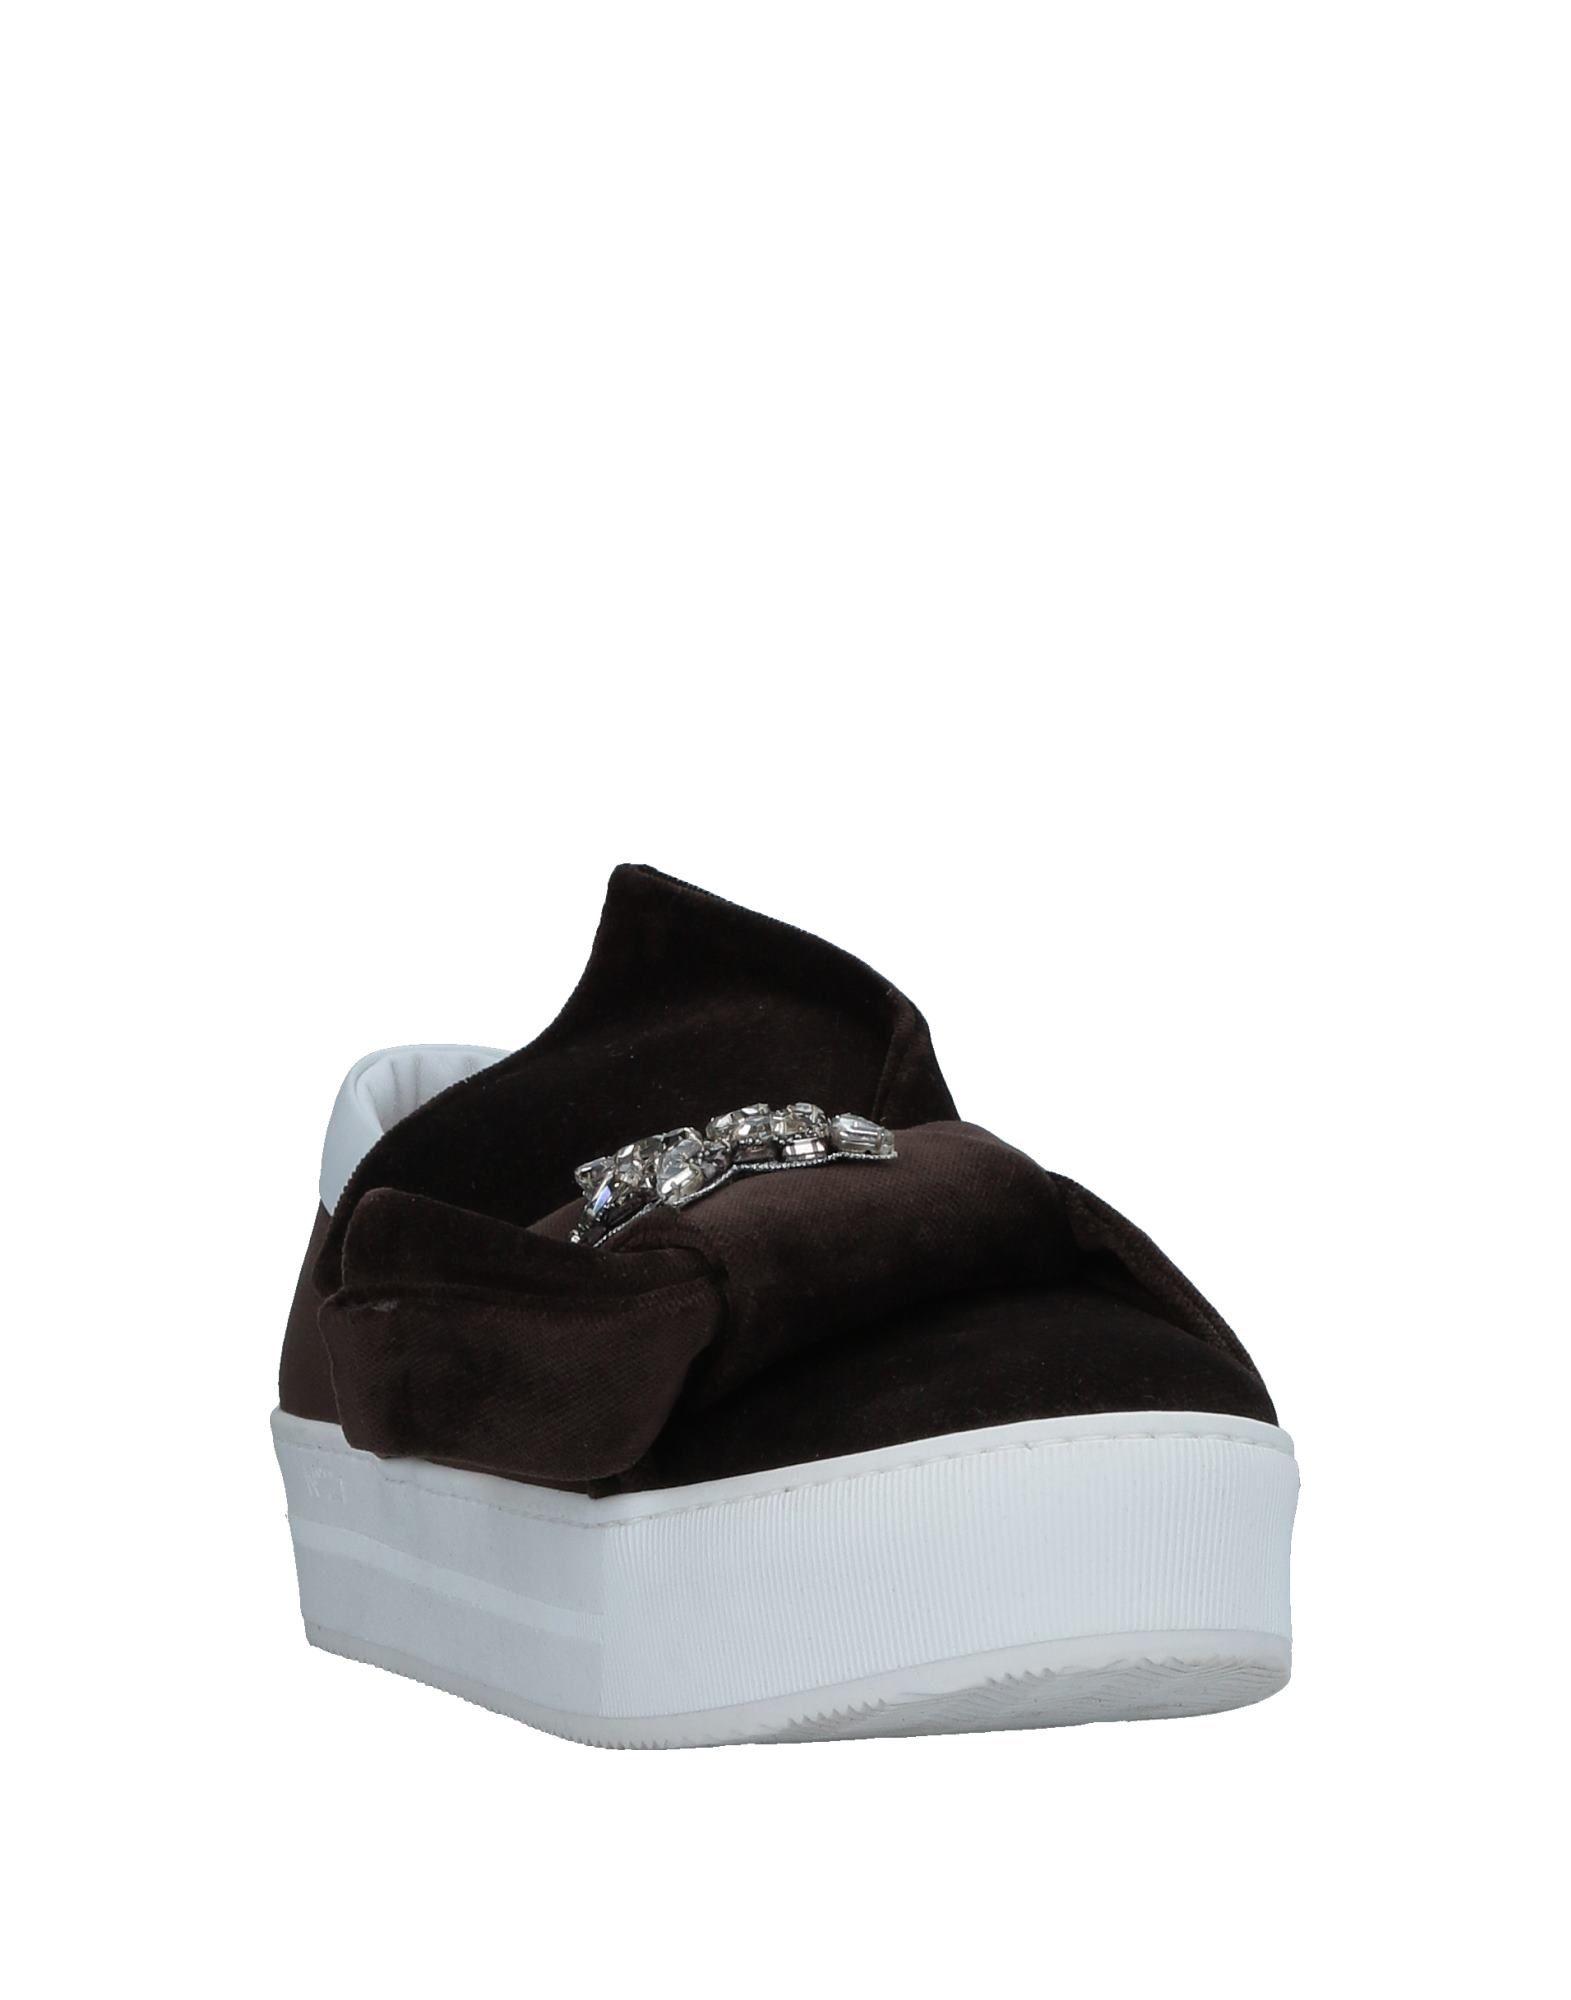 N° 21 Sneakers Damen Schuhe  11445438XHGünstige gut aussehende Schuhe Damen c8e299